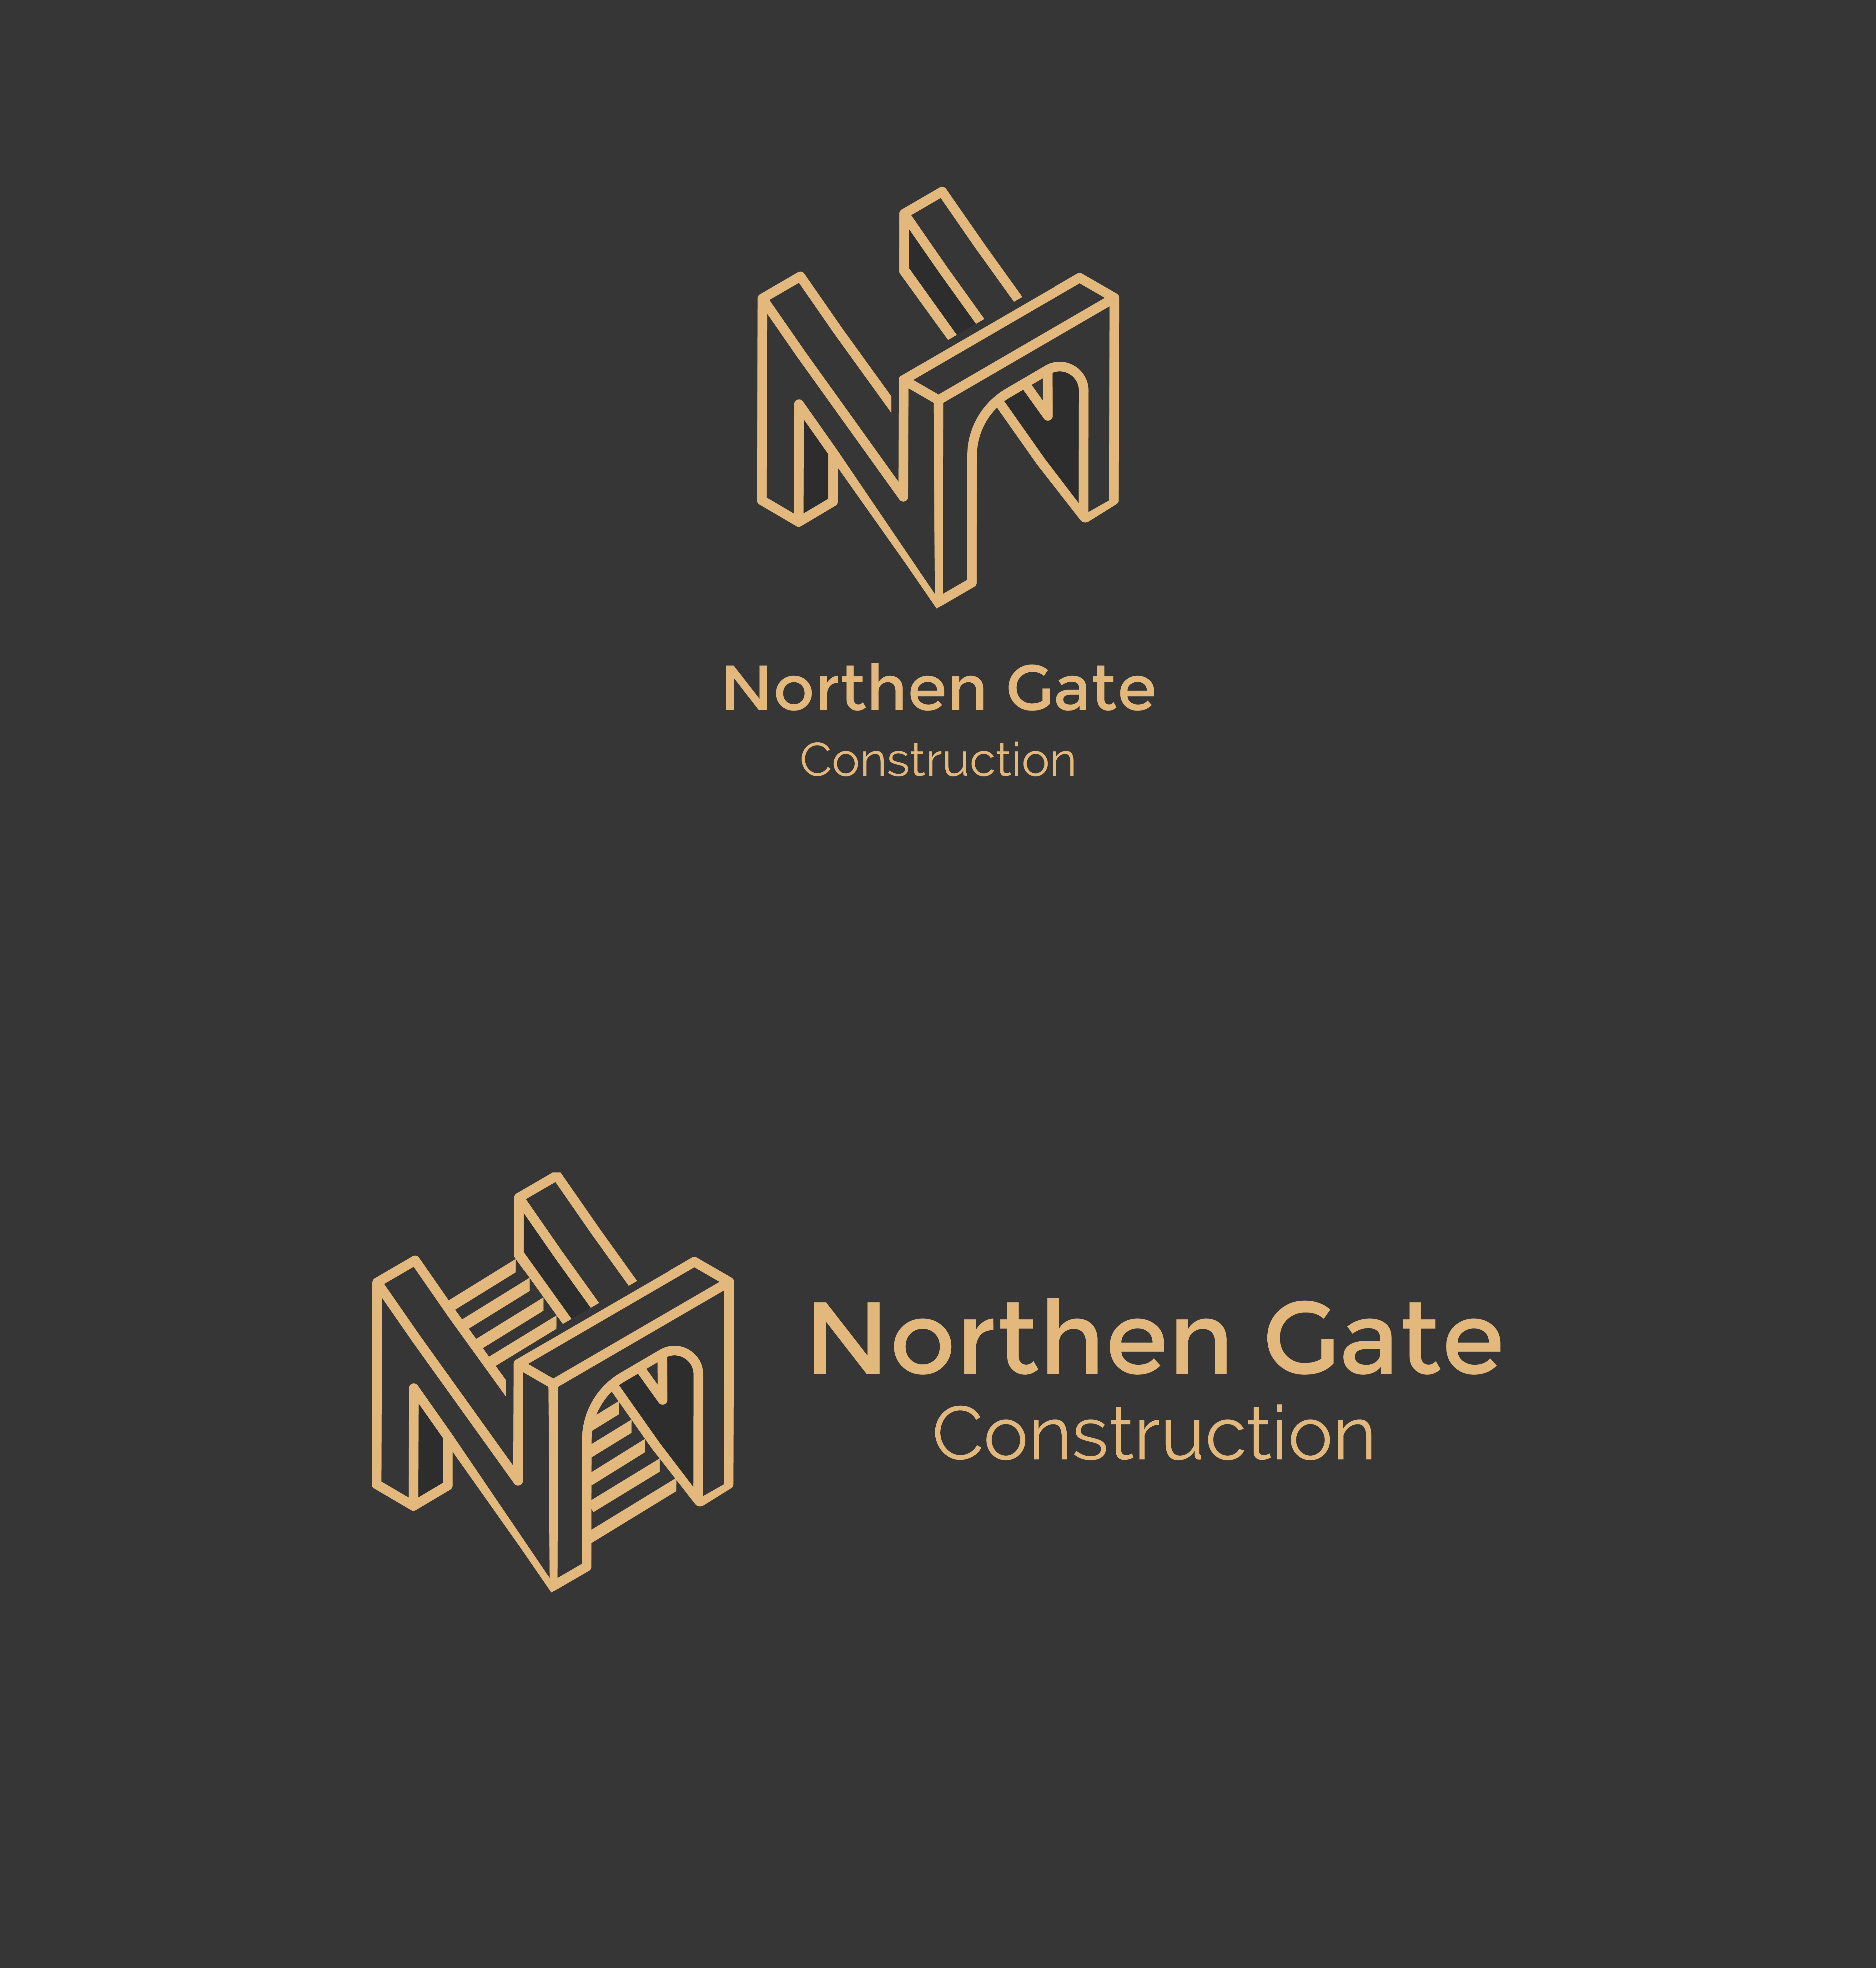 Letter N - Construction Gate Bridge Logo Logo Template example image 10